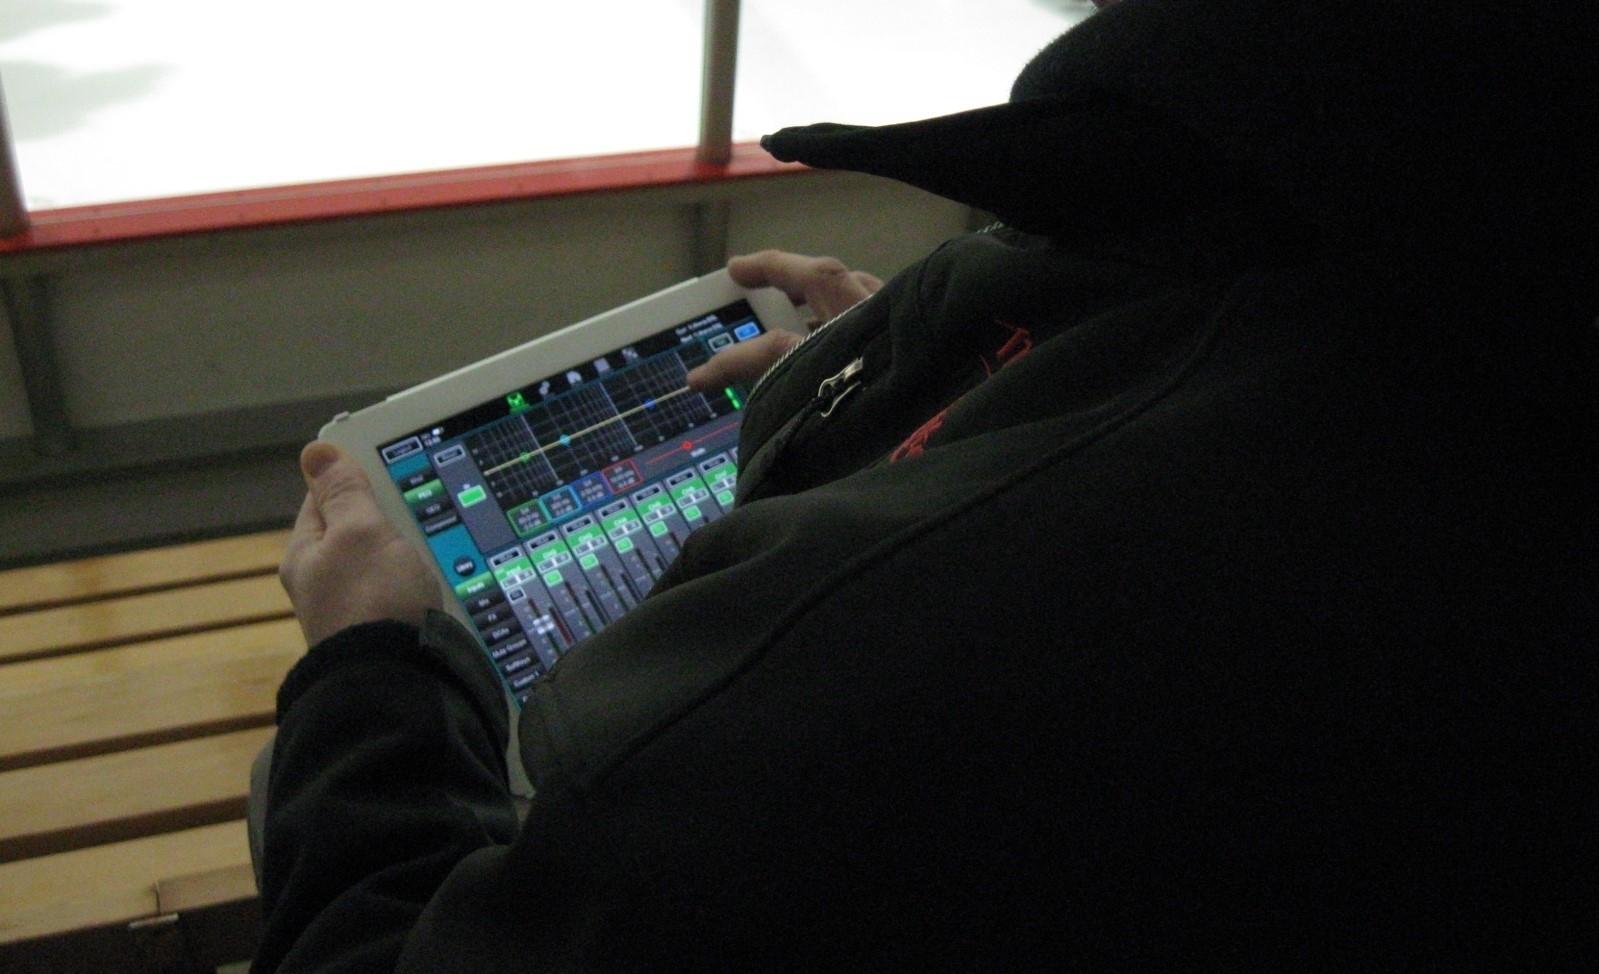 E-lite inc à Montréal: Network sound adjustment with an iPad. Allen & Heath